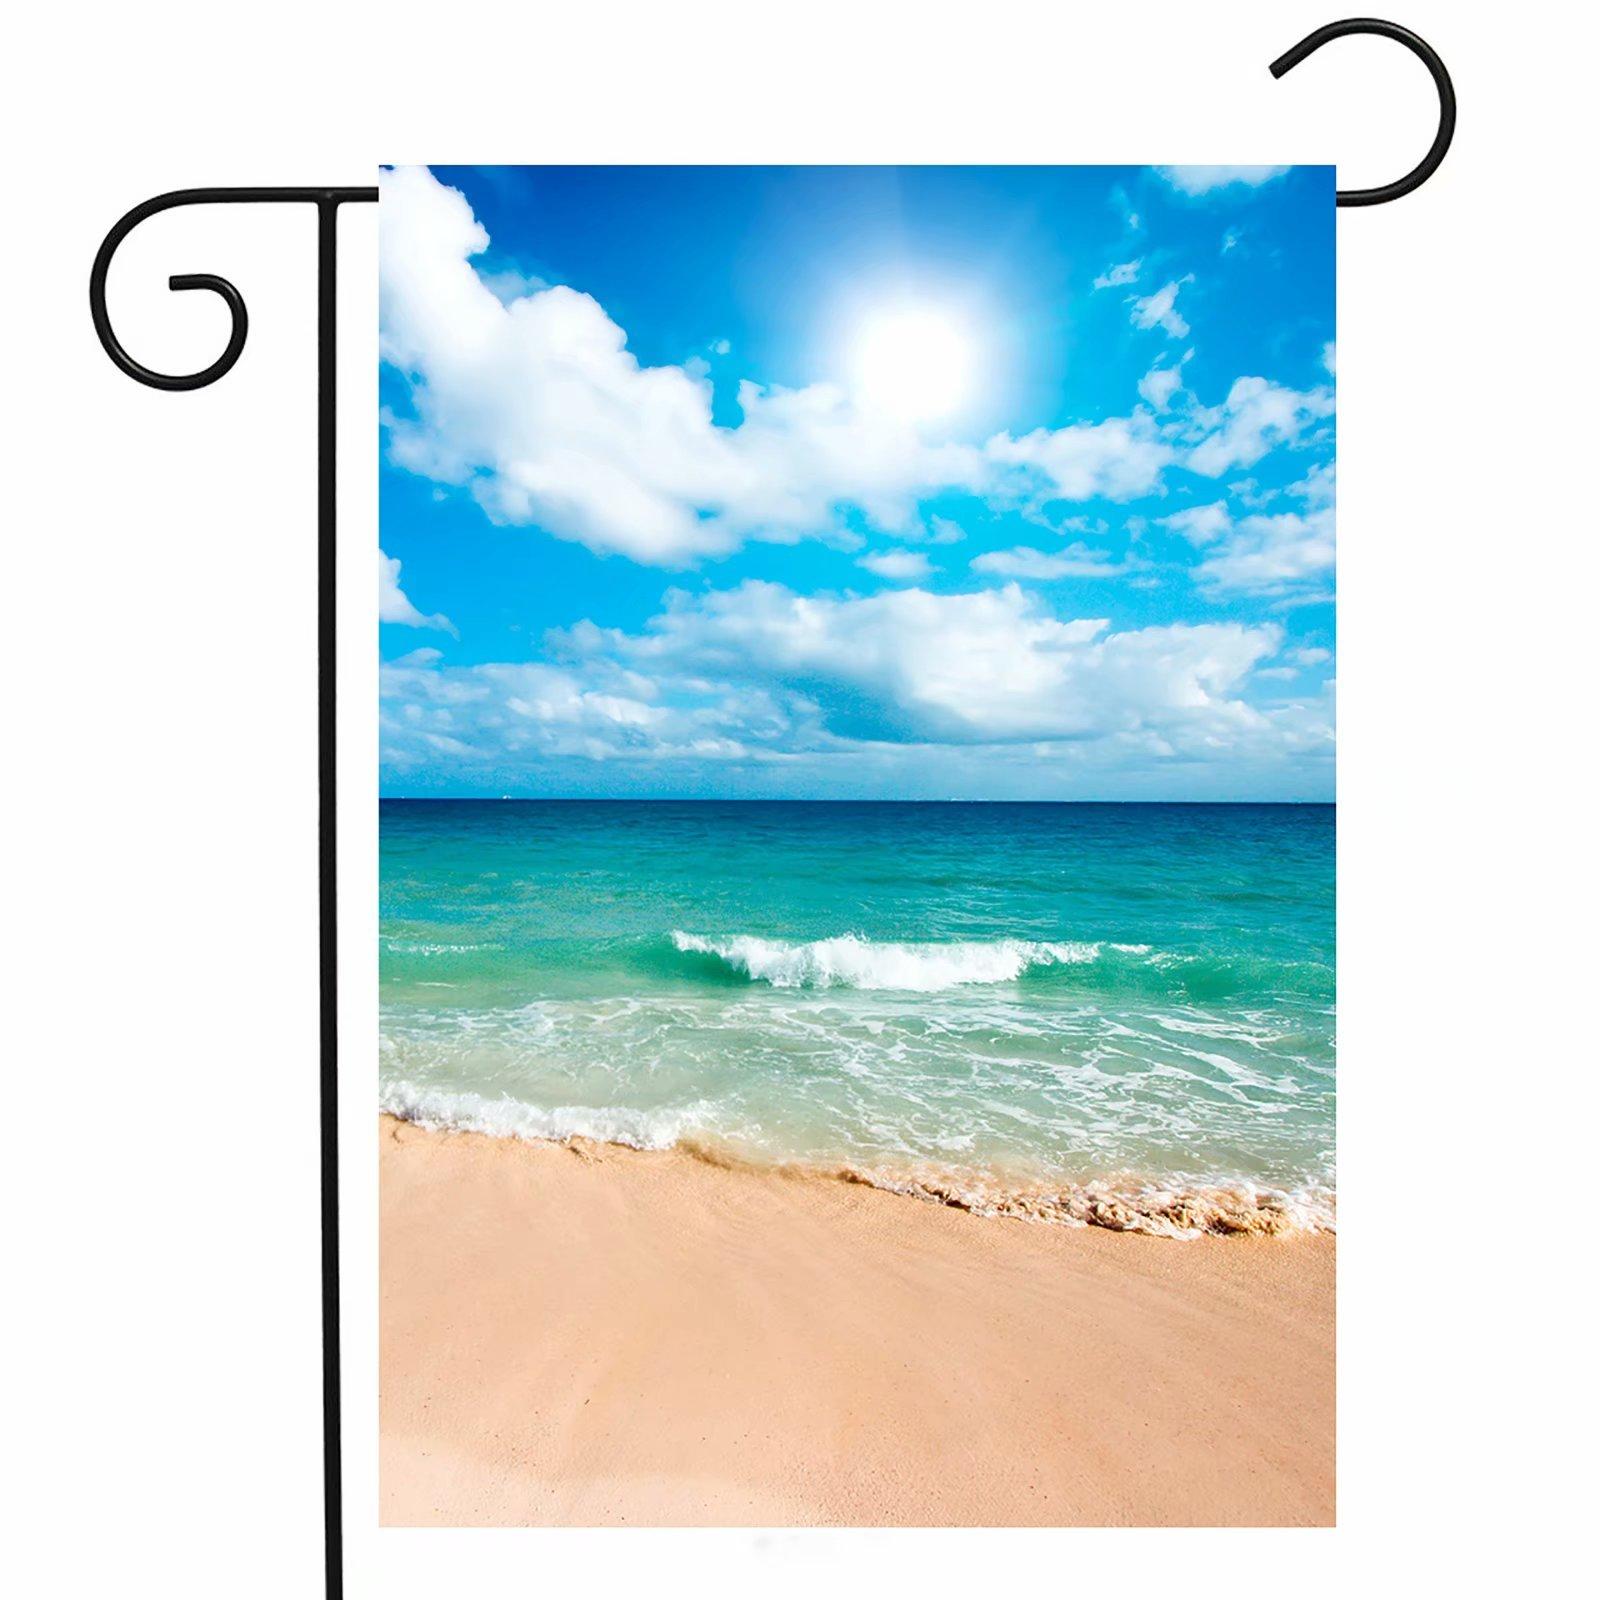 ShineSnow Summer Beach Ocean Garden Yard Flag 12''x 18'' Double Sided, Tropical Mexican Yucatan Caribbean Sunlight Waves Sea Polyester Welcome House Flag Banners for Patio Lawn Outdoor Home Decor